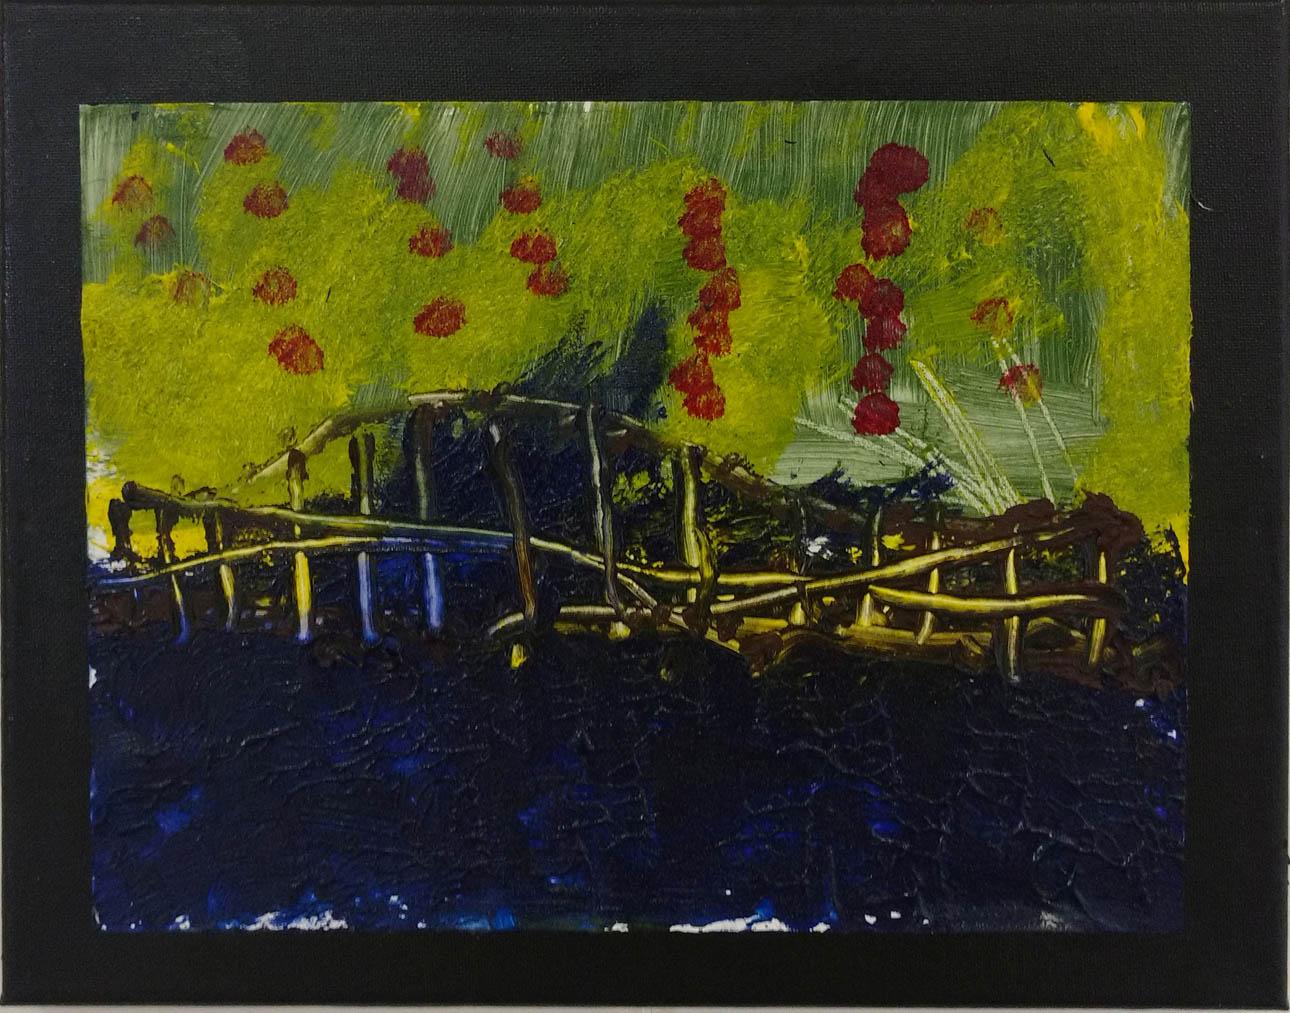 Kyle's Monet's Bridge